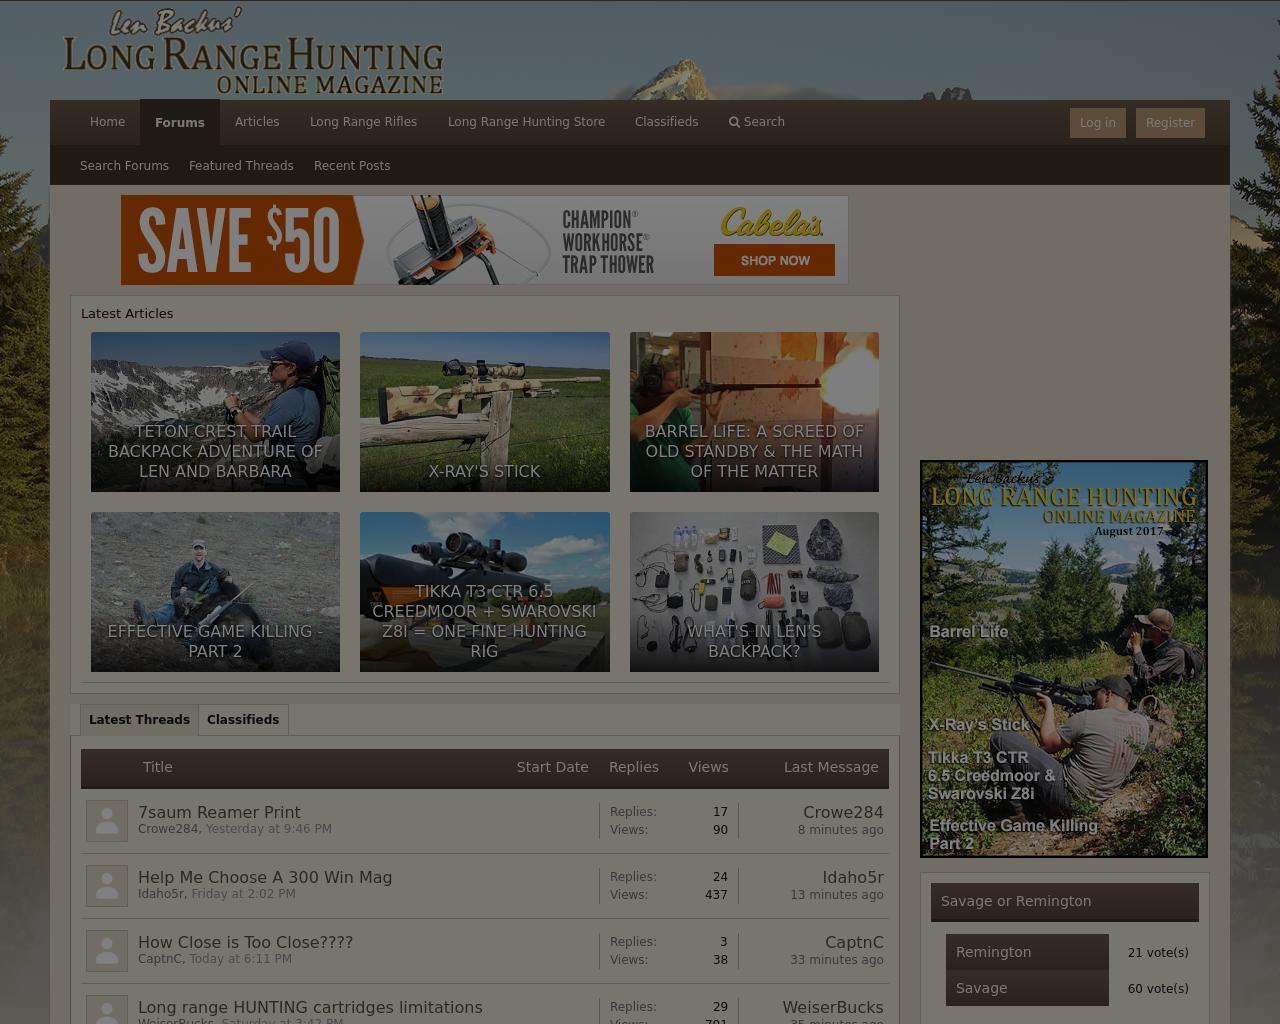 Long-Range-Hunting-Online-Magazine-Advertising-Reviews-Pricing